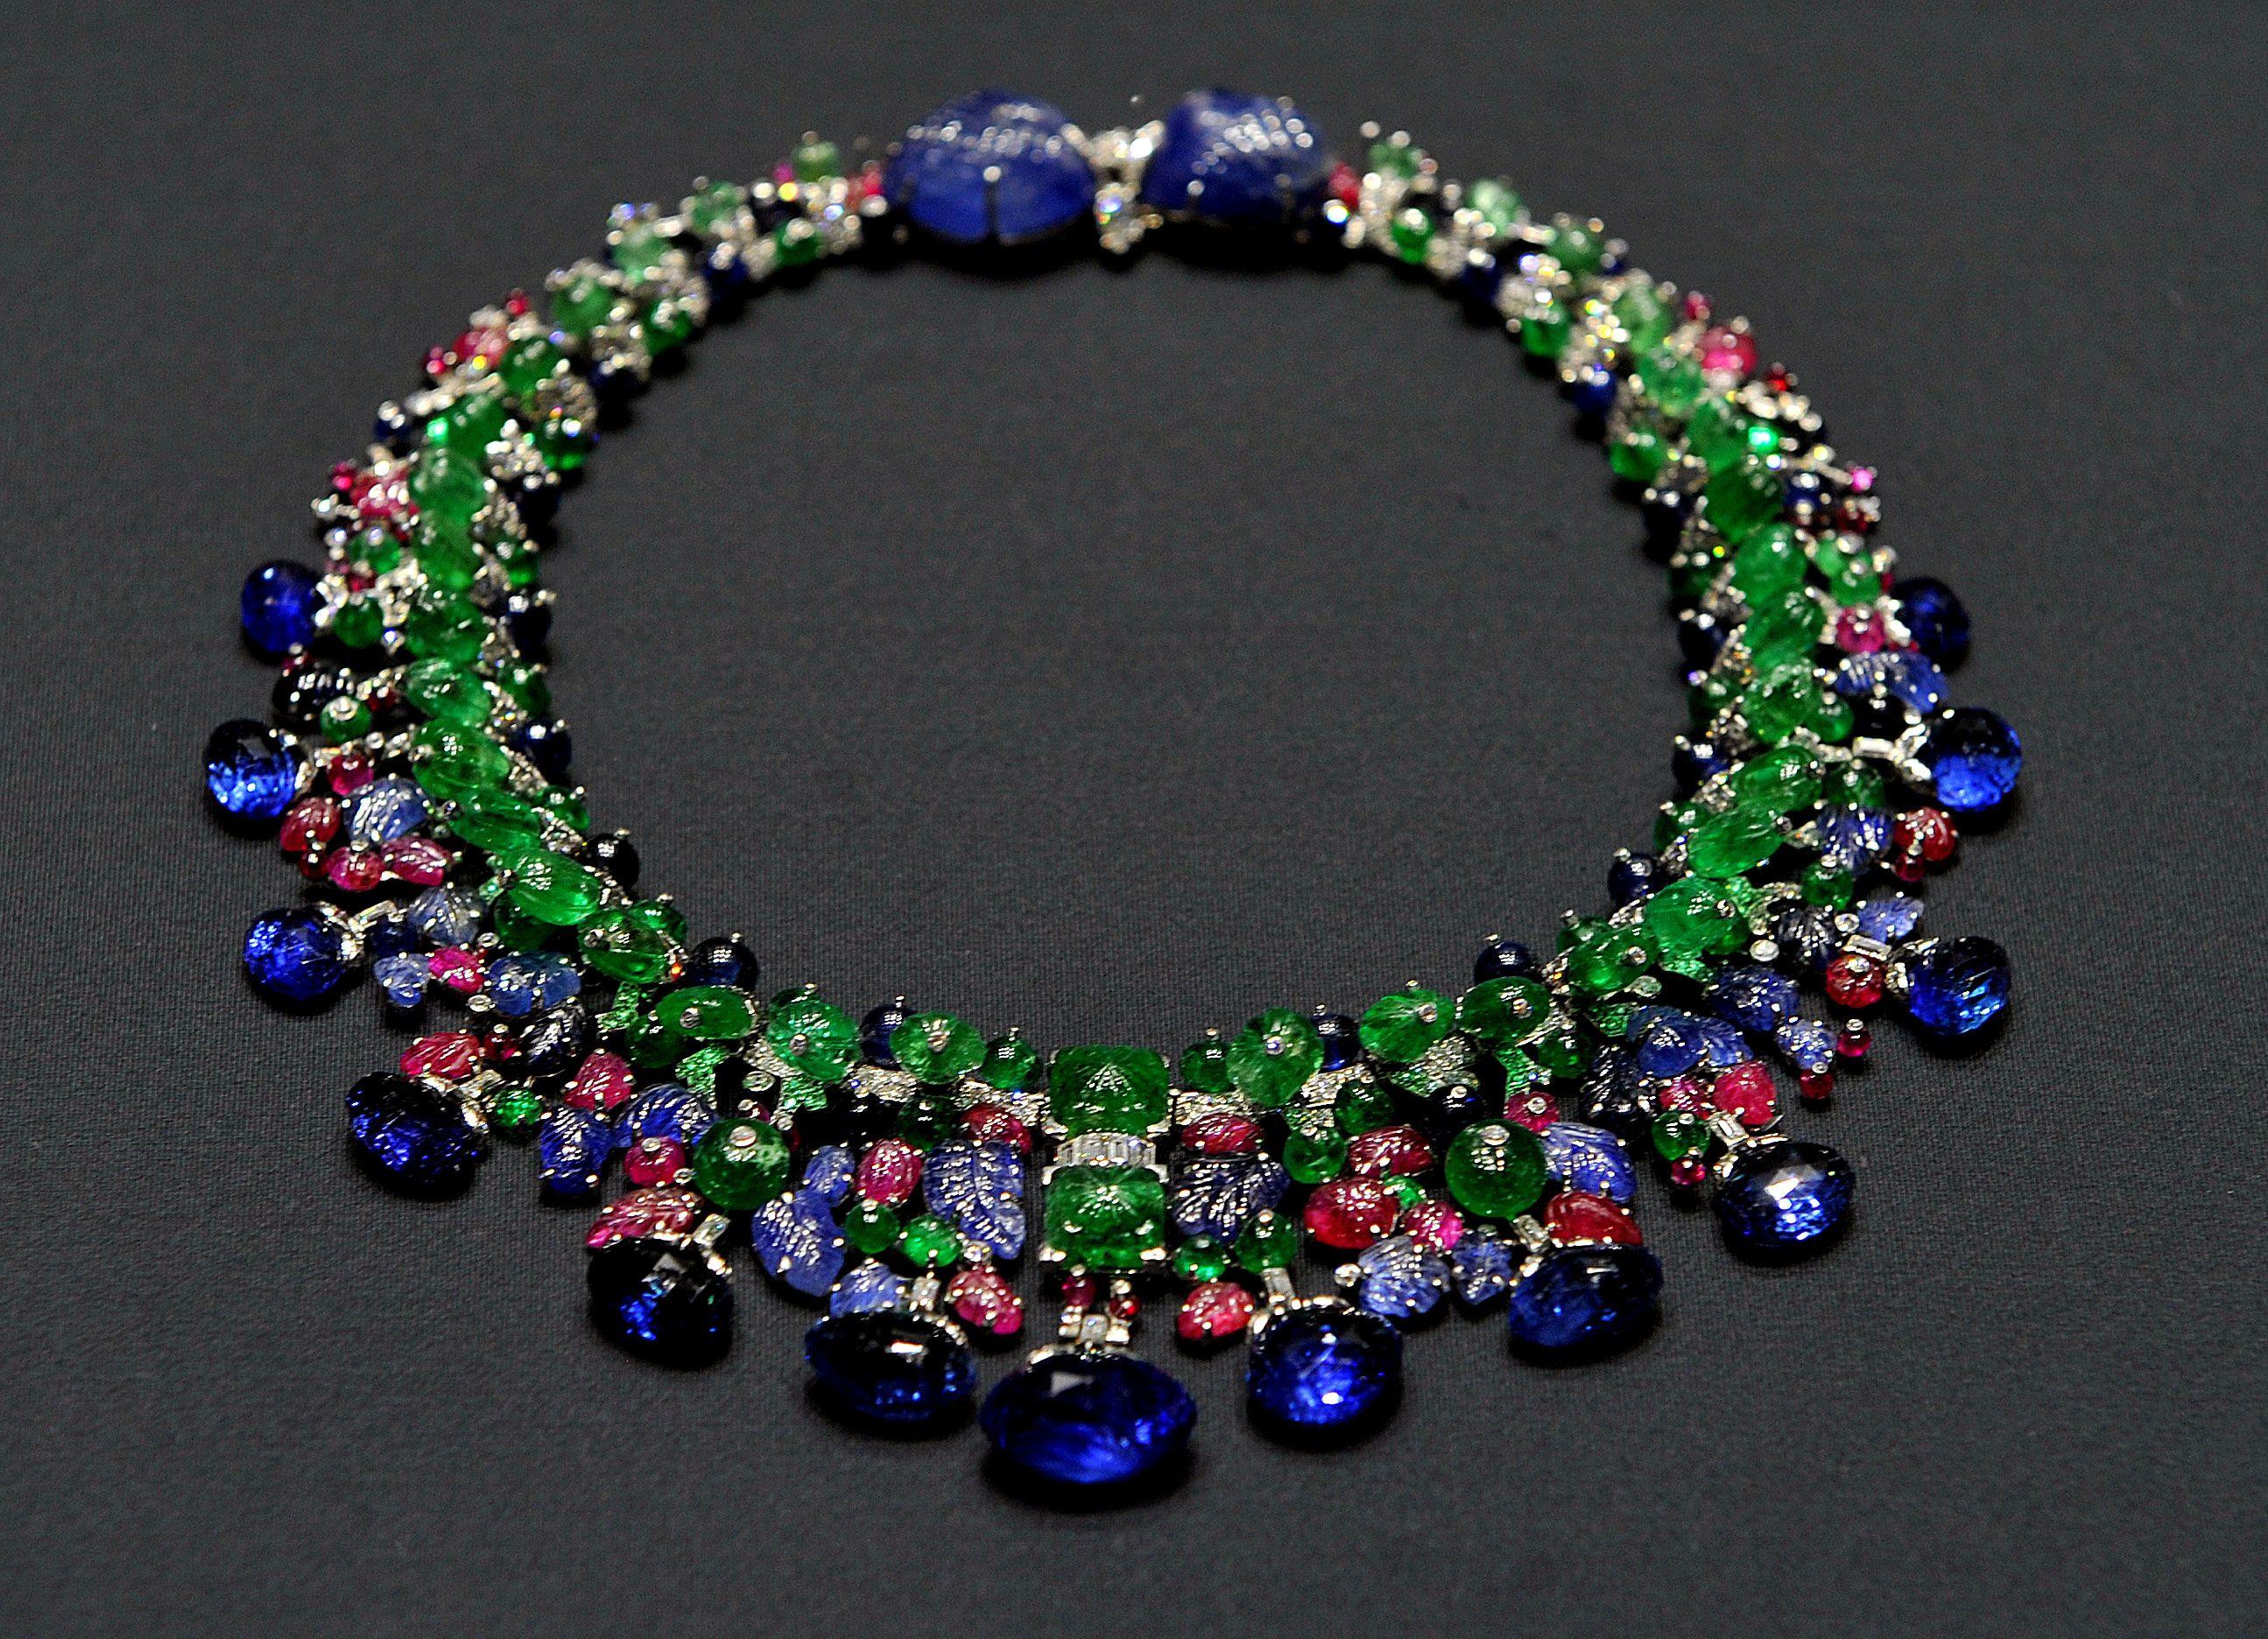 The Tutti Frutti Necklace by Cartier